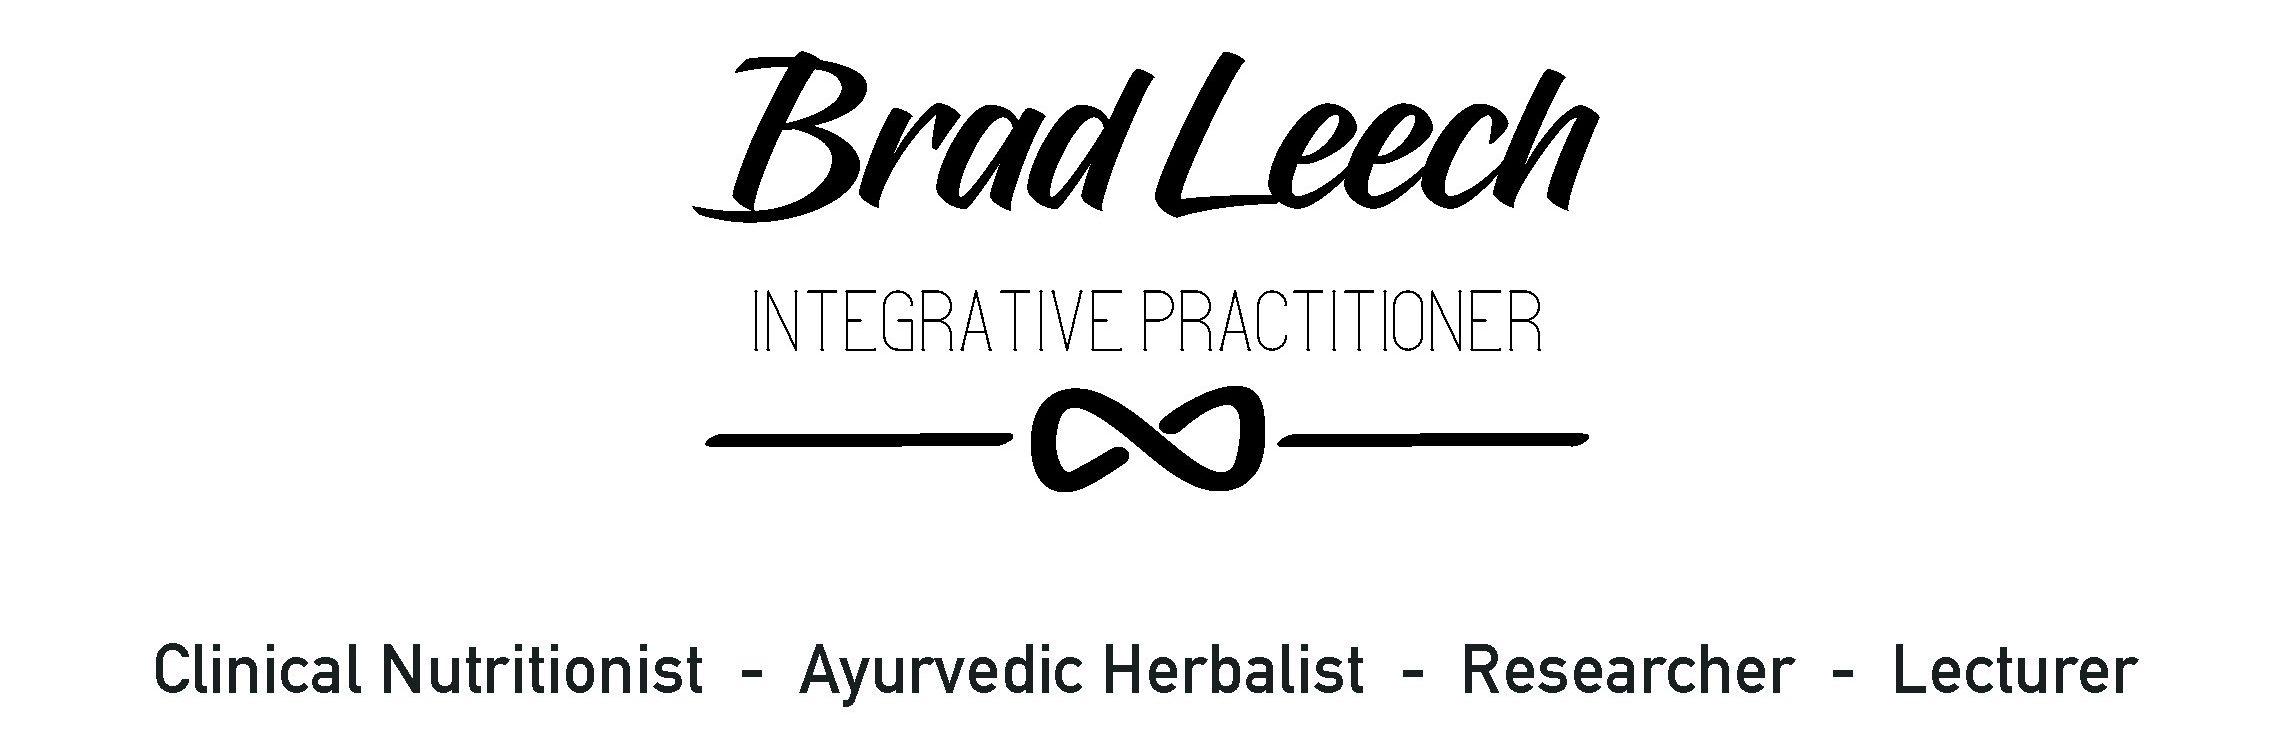 Brad Leech